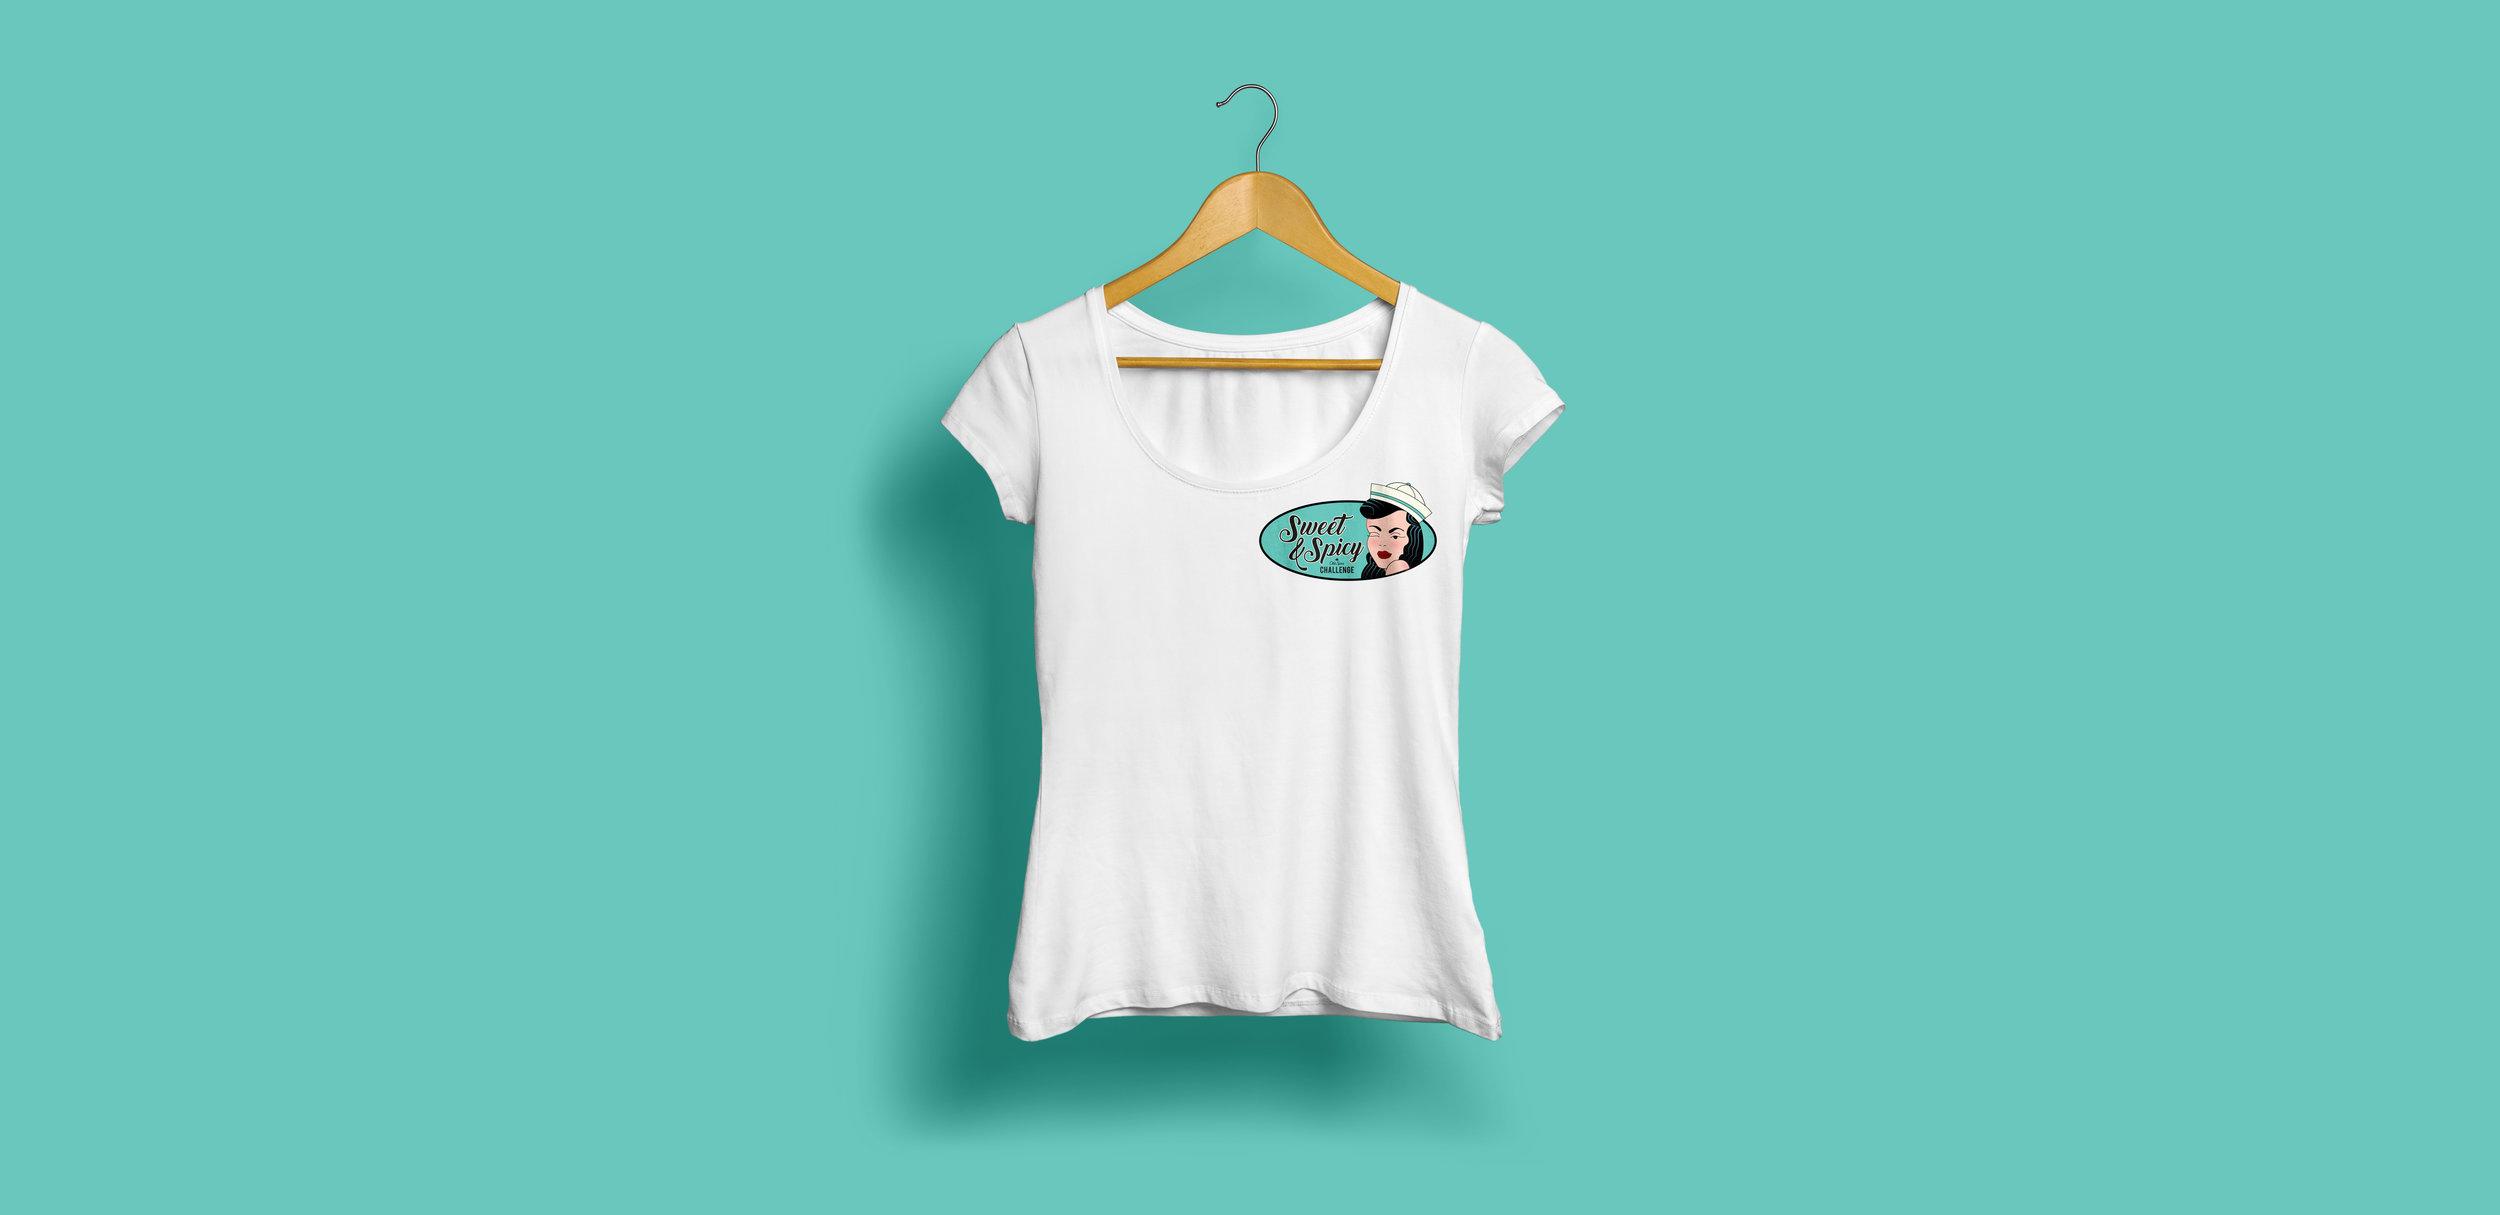 S&S-Challenge-Shirt-Front-Branded.jpg